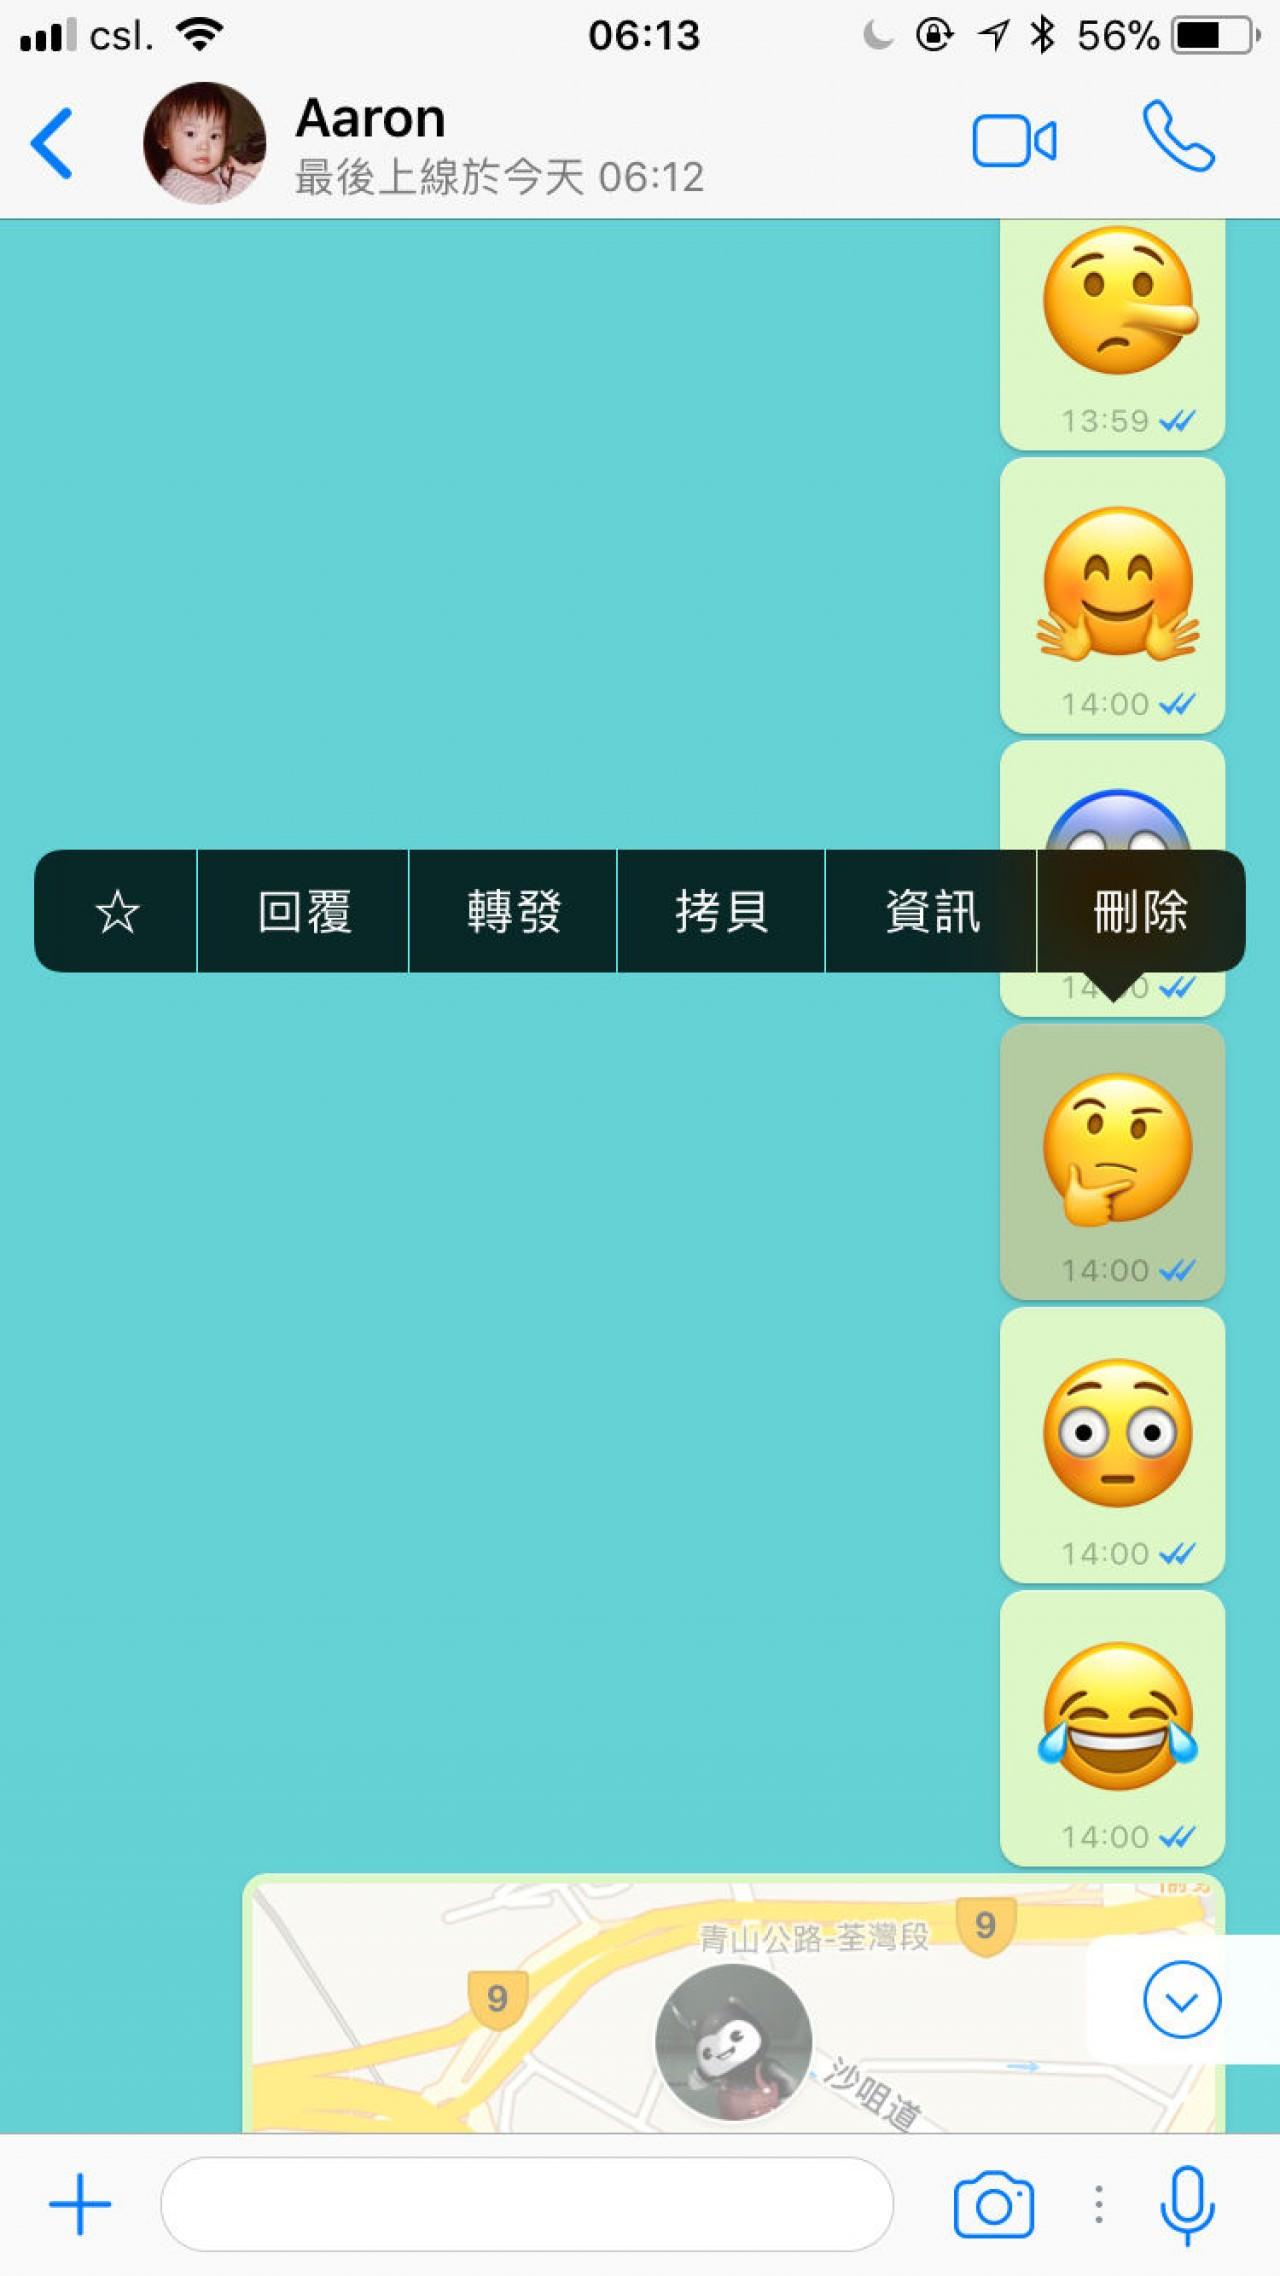 WhatsApp超好用的13個「隱藏功能」 可以關閉已讀藍勾勾,還可以隱藏最后上線時間!大家不要再浪費這些功能了~